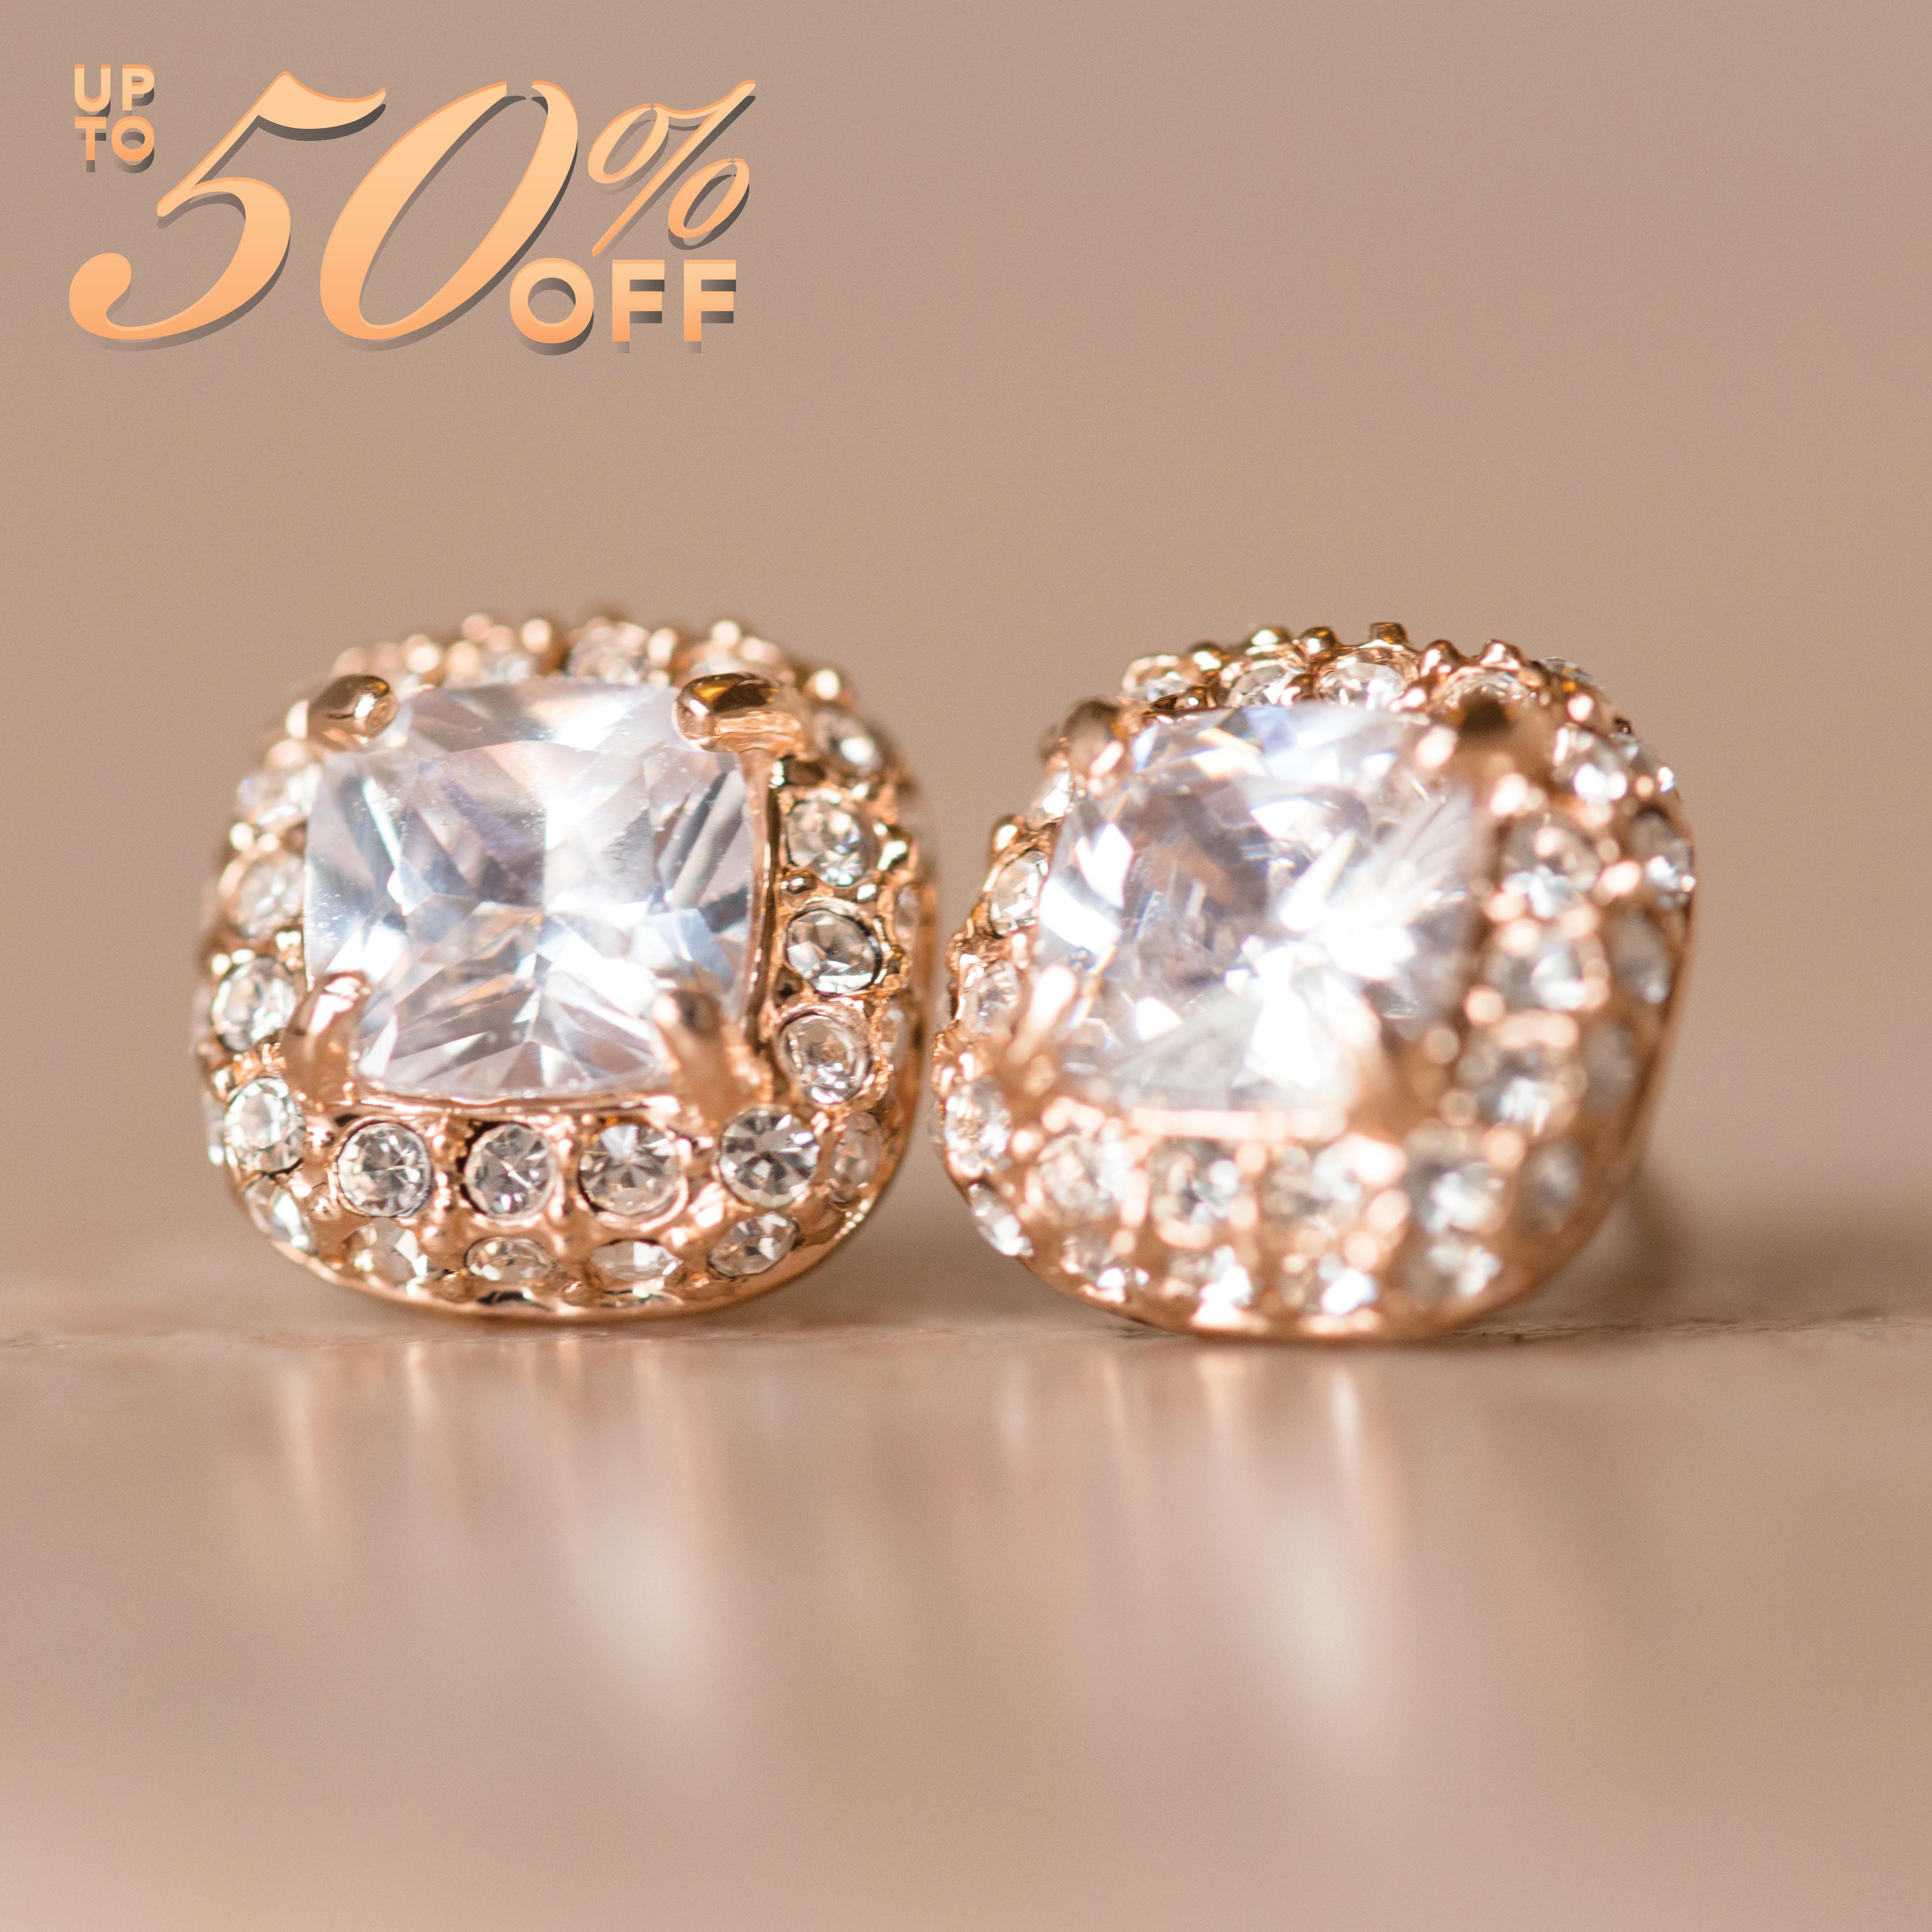 Diamond Promotion